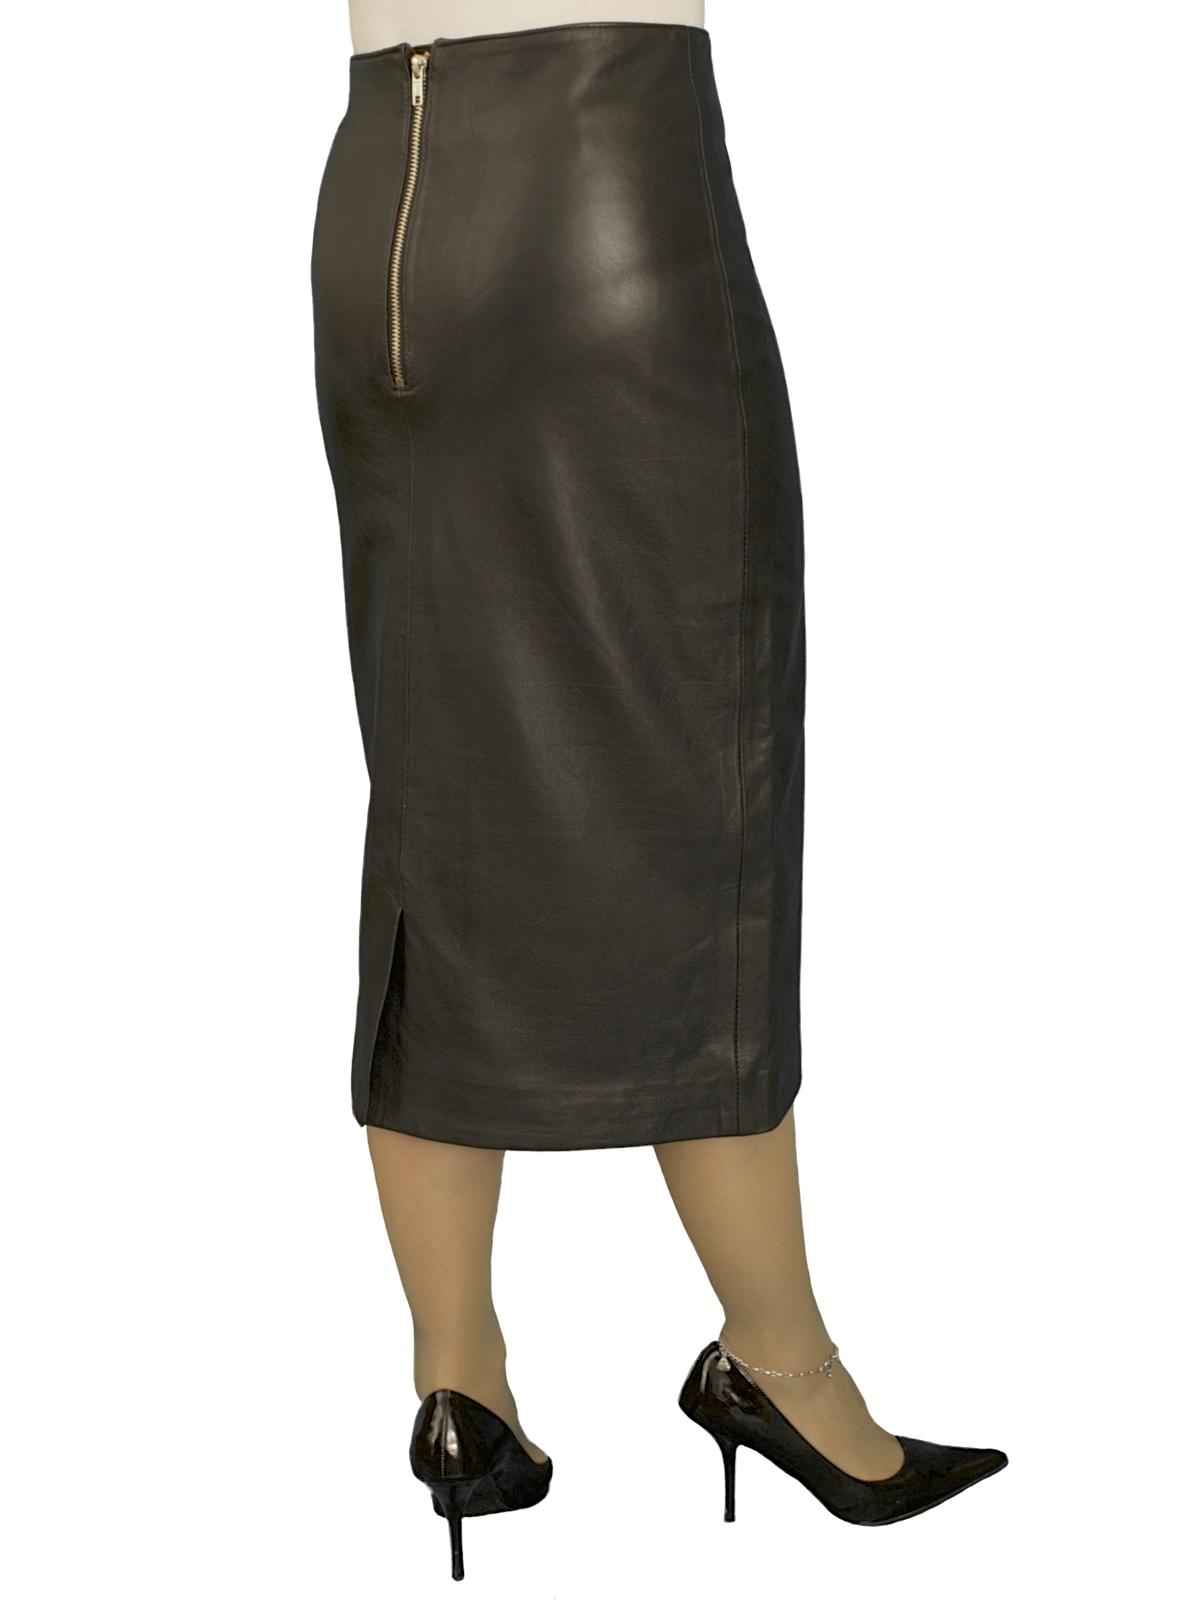 Luxury Black Leather Midi Pencil Skirt (27in length), kick pleat